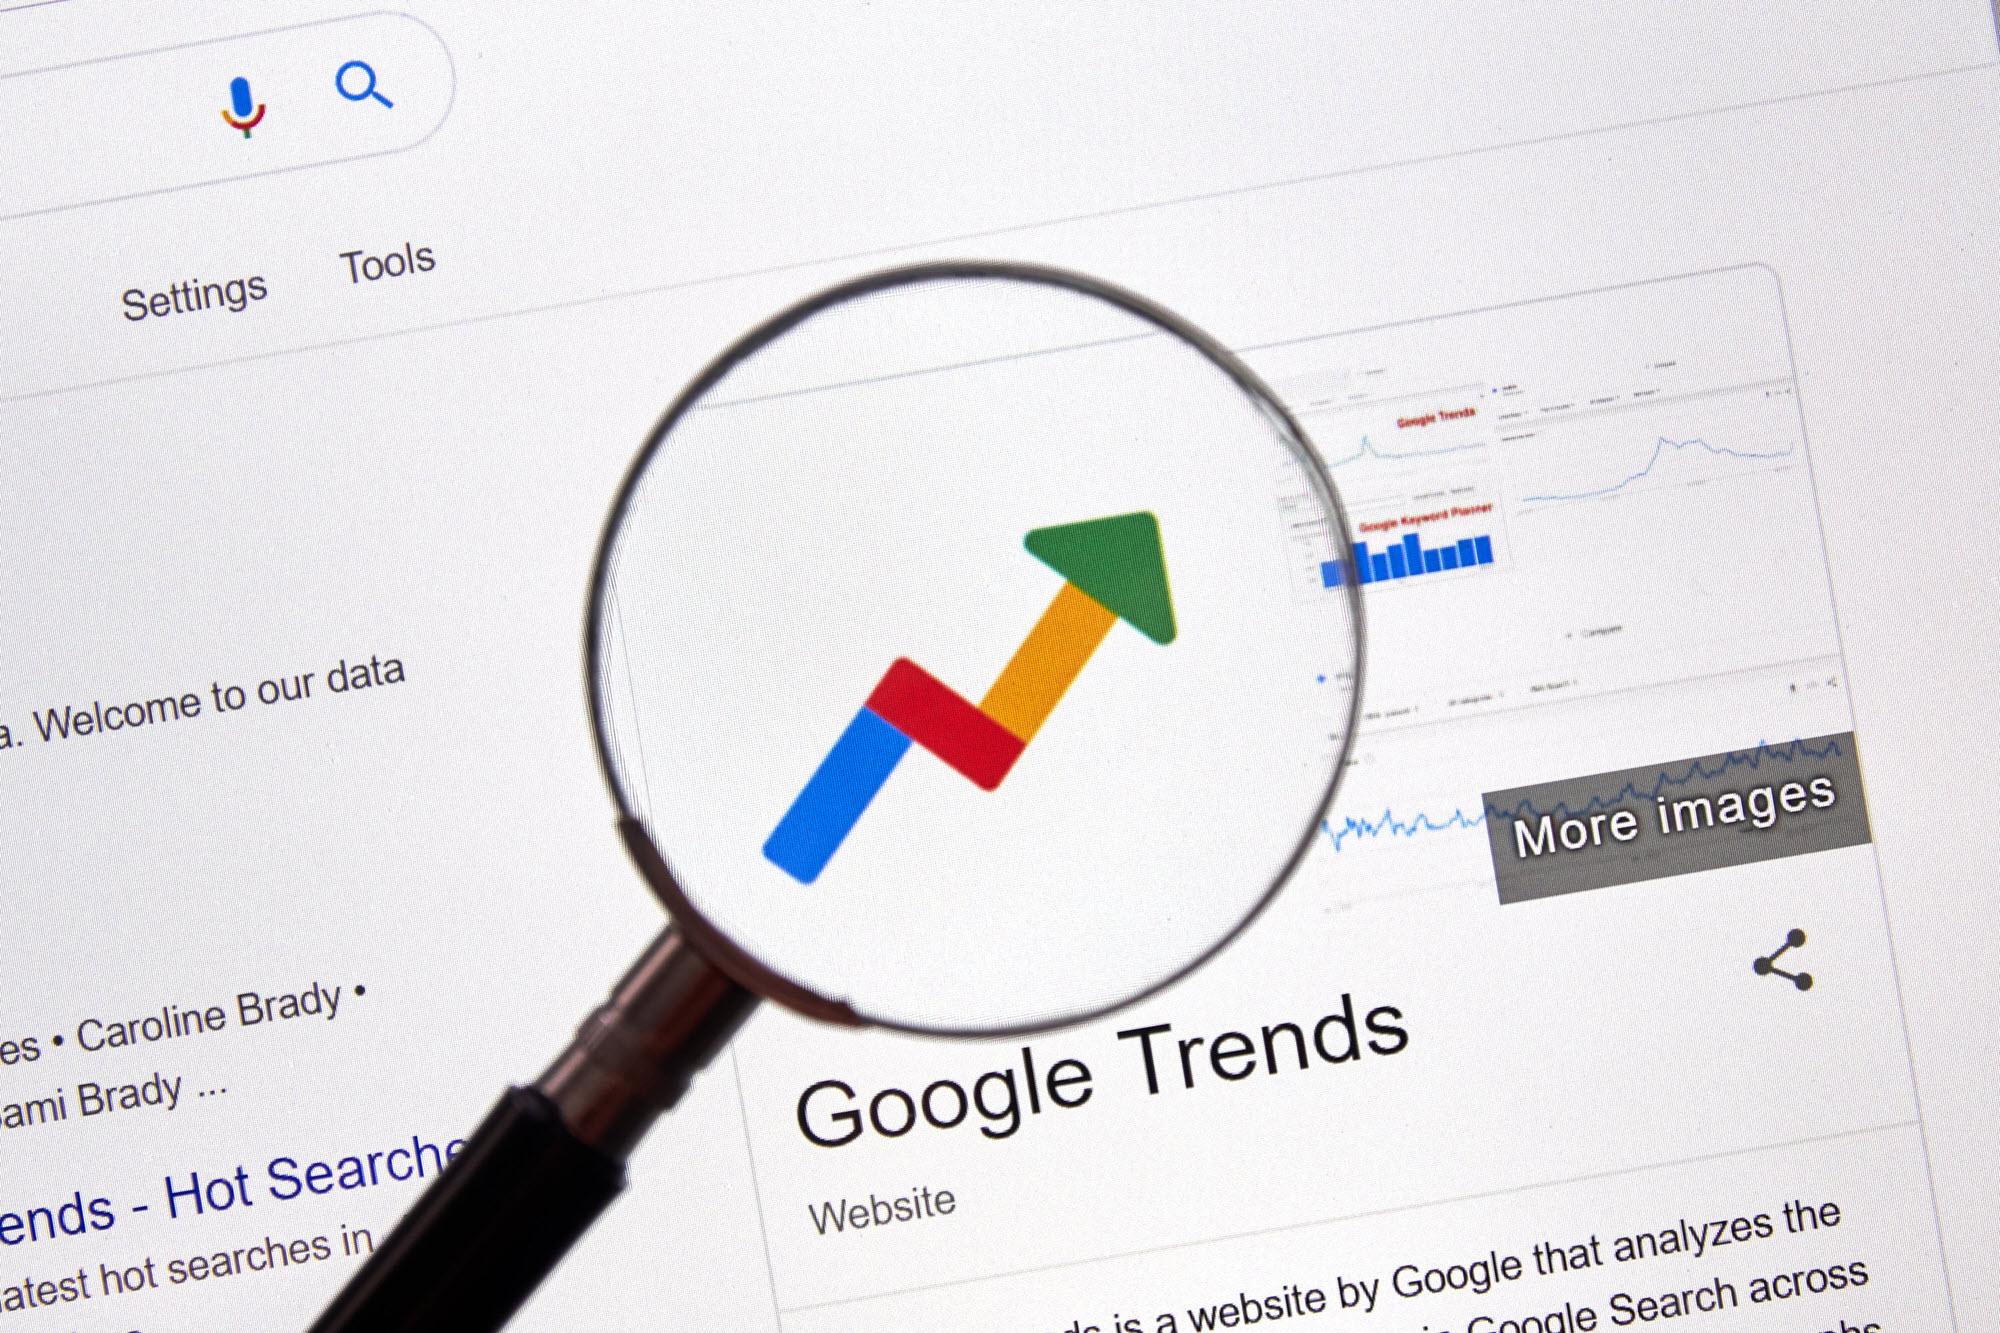 Google Trends for emerging topics in Australia.